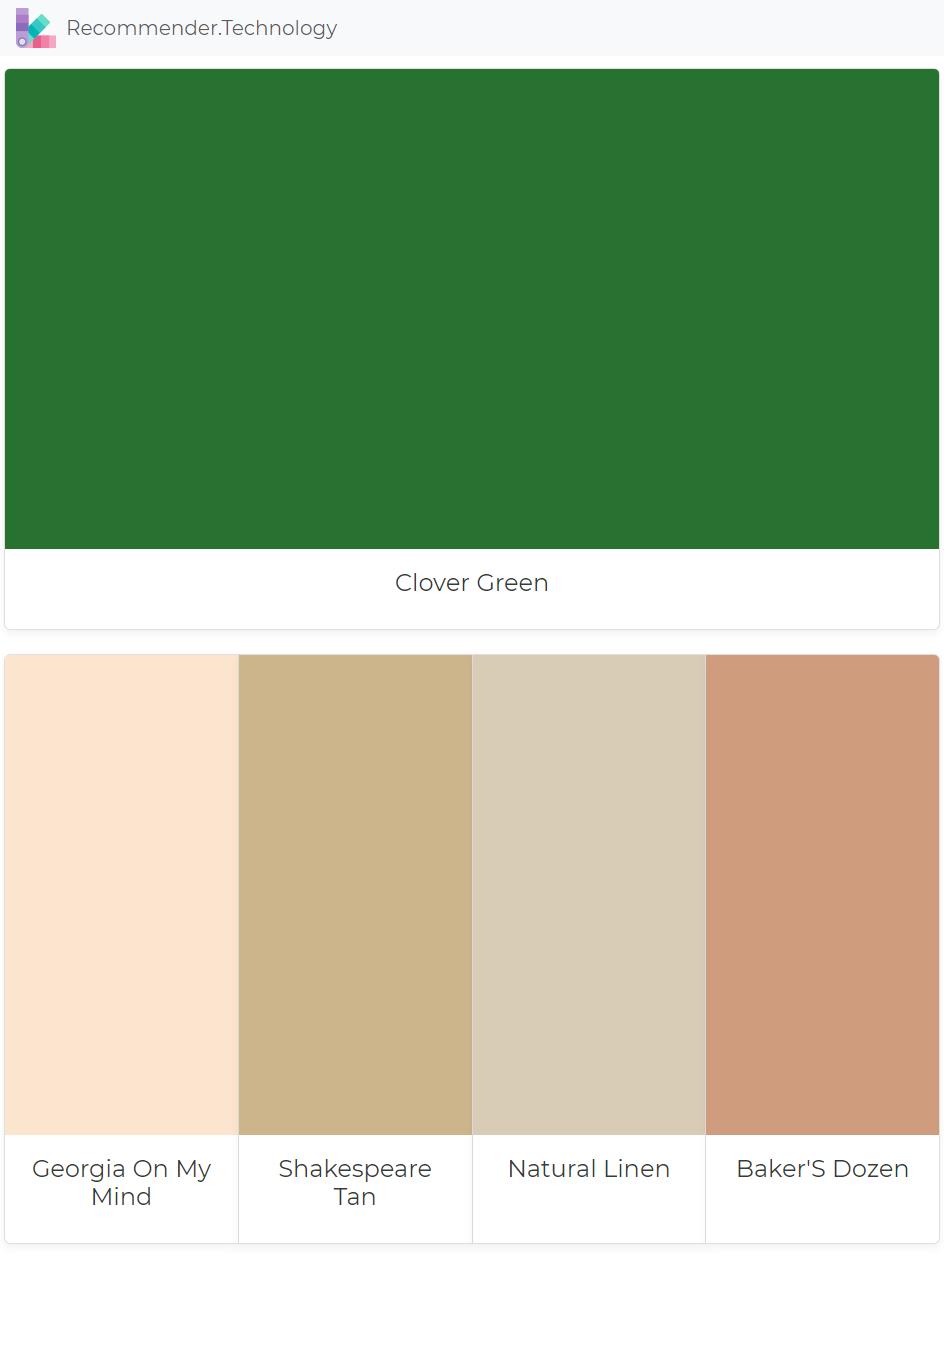 Clover Green Georgia On My Mind Shakespeare Tan Natural Linen Baker S Dozen